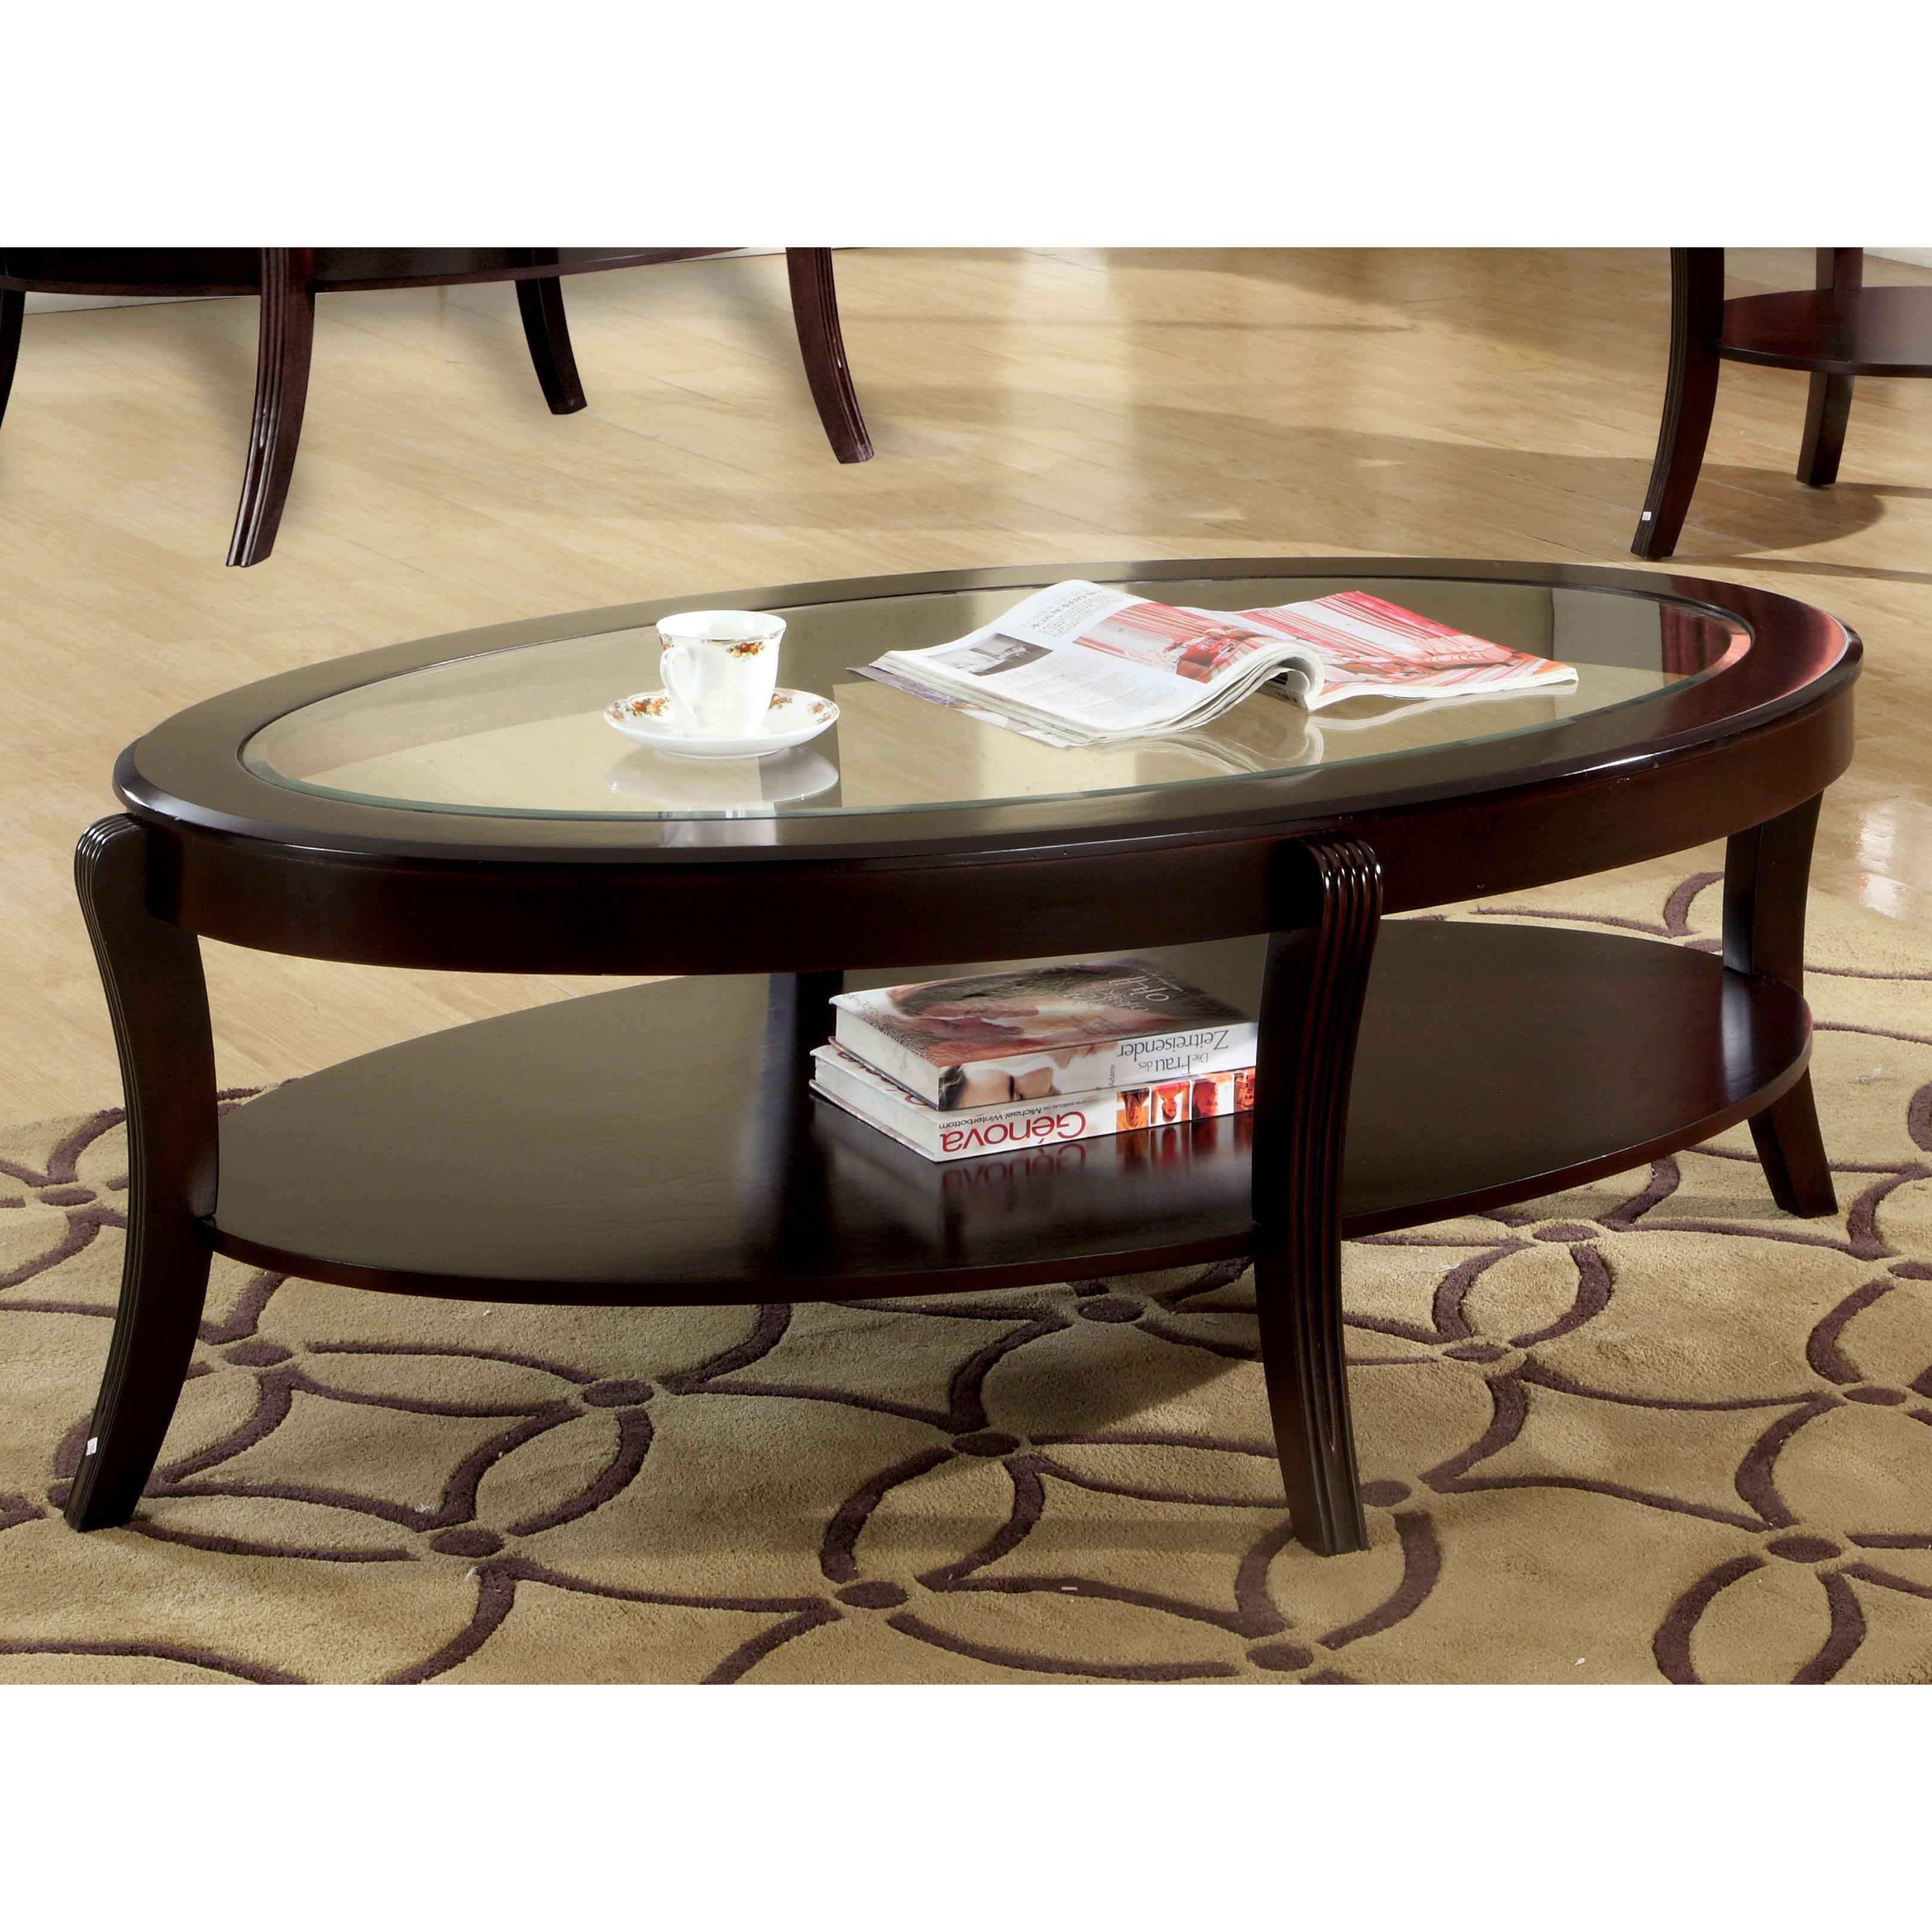 Furniture Of America Carline Modern Espresso Coffee Table With Regard To 2020 Evalline Modern Dark Walnut Coffee Tables (View 8 of 20)